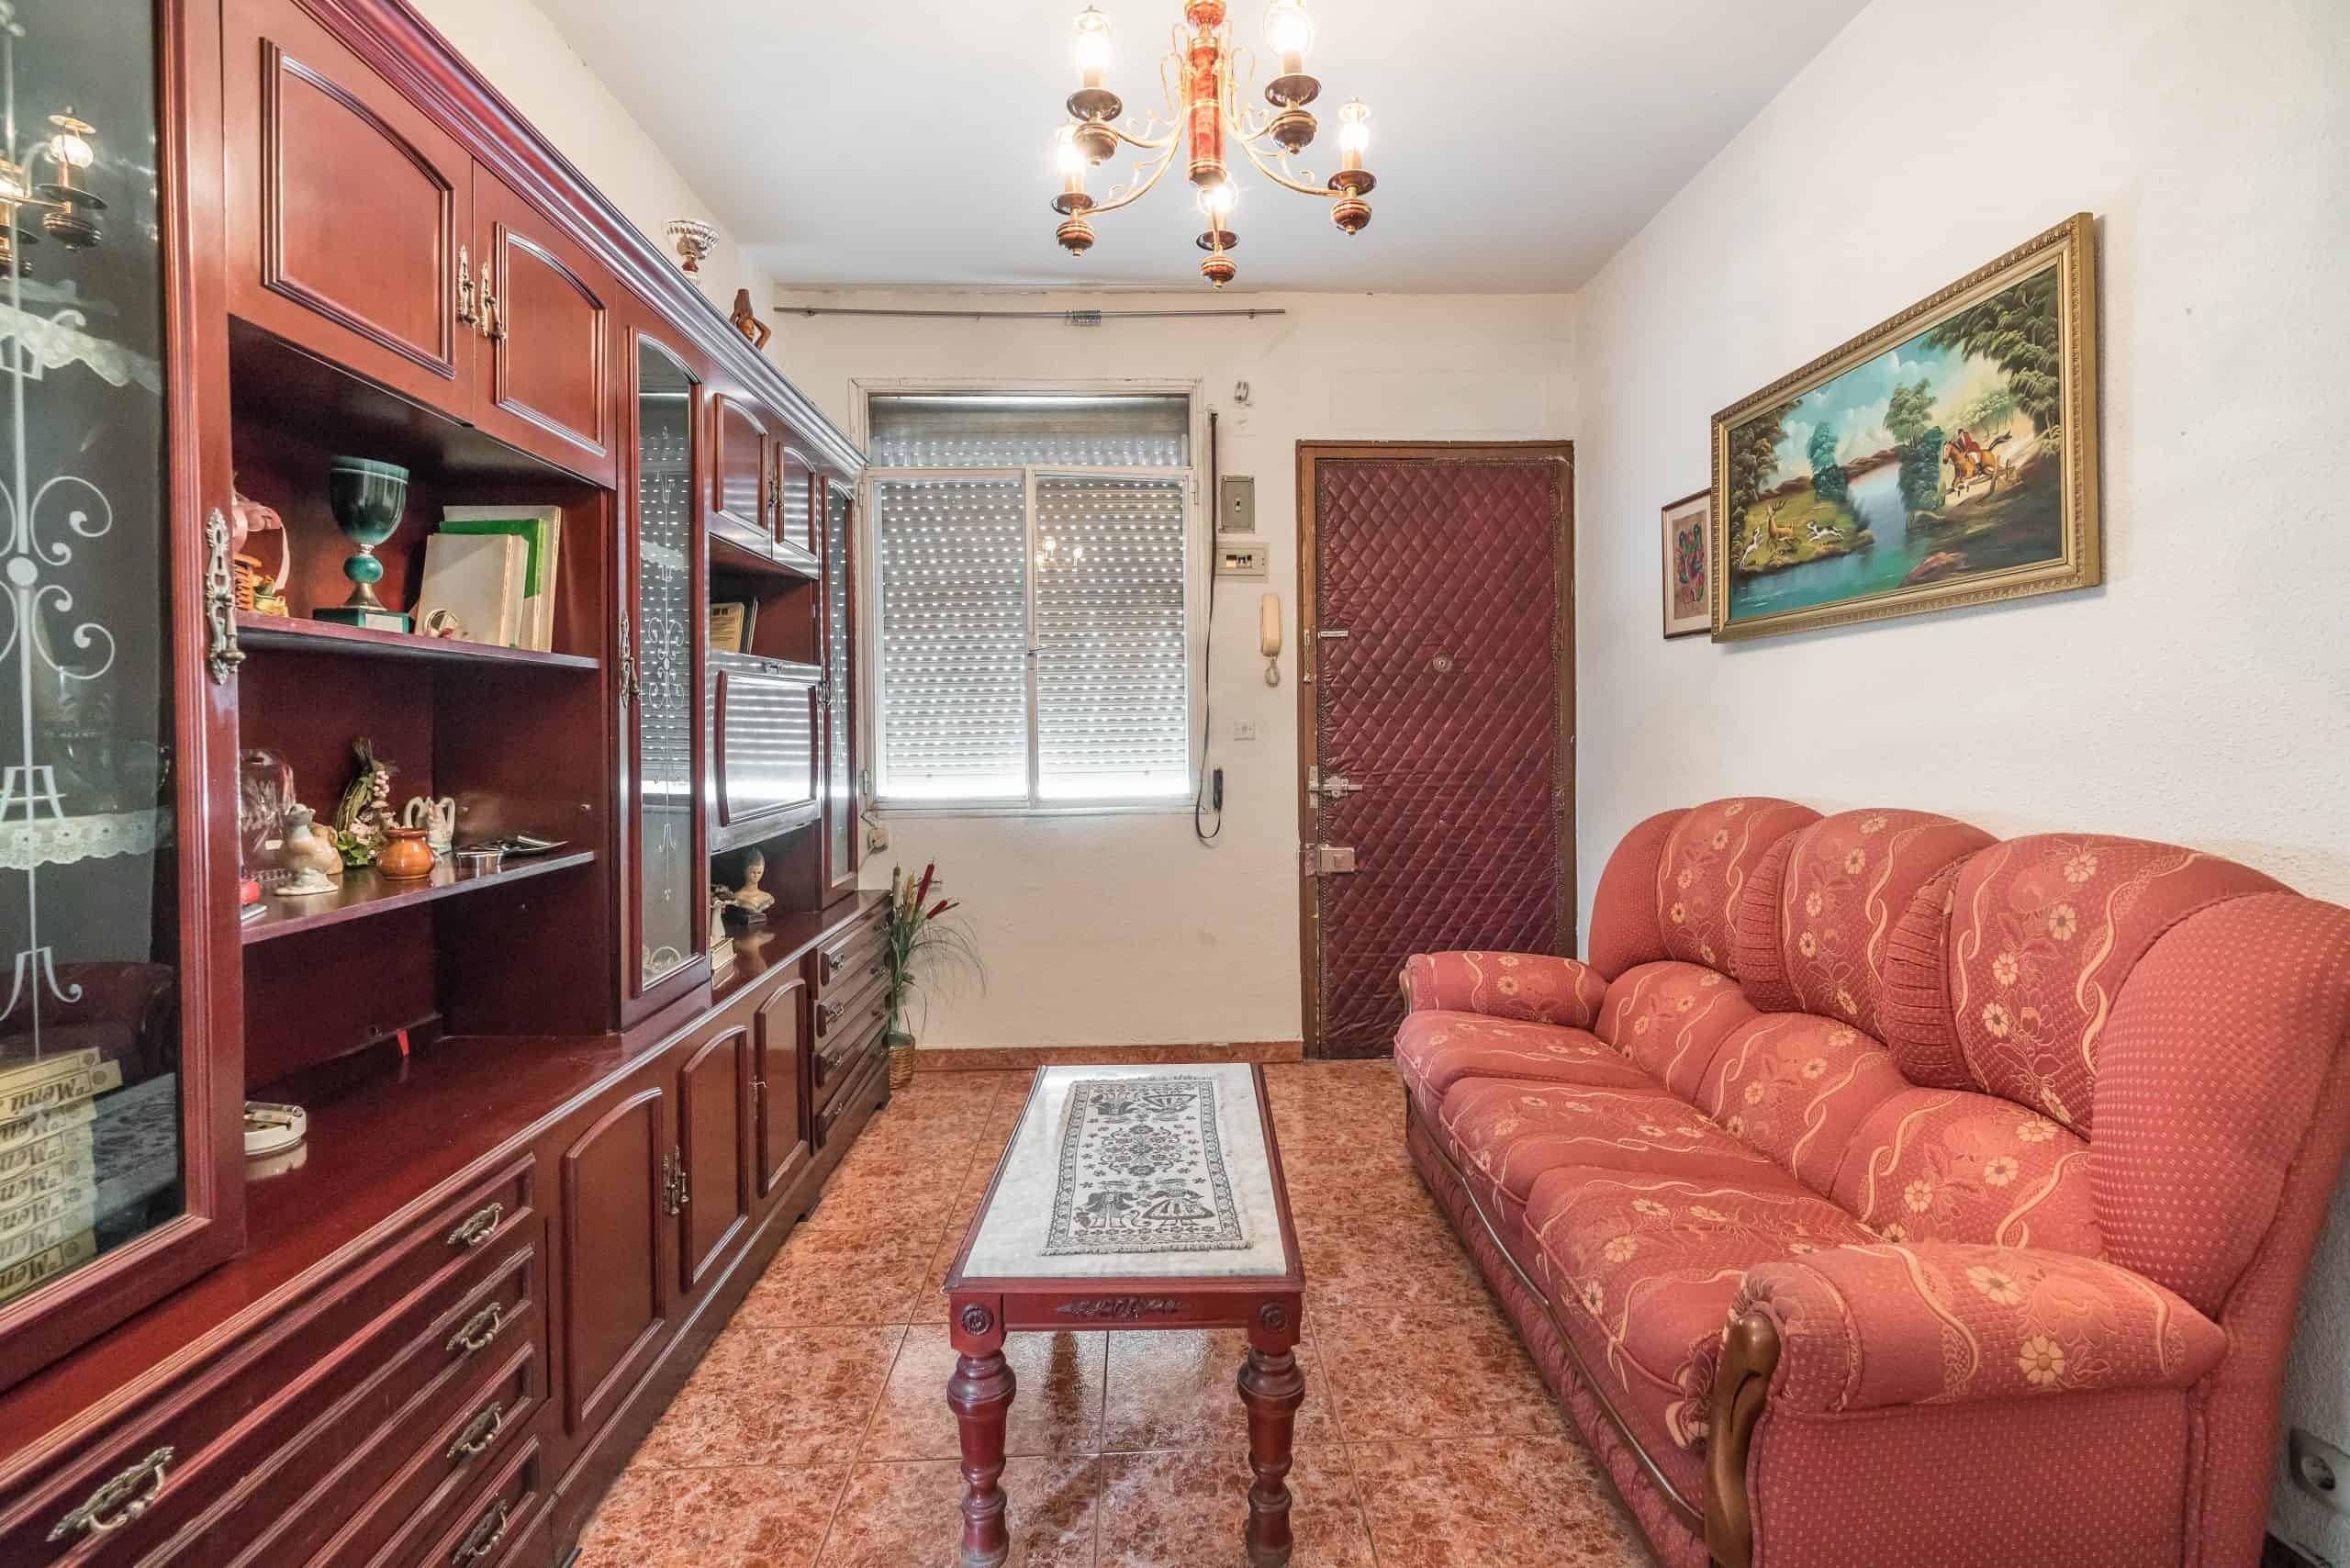 Agencia Inmobiliaria de Madrid-FUTUROCASA-Zona ARGANZUELA-EMBAJADORES-LEGAZPI -calle DOMINGO PEREZ DEL VAL -1 SALON (1)